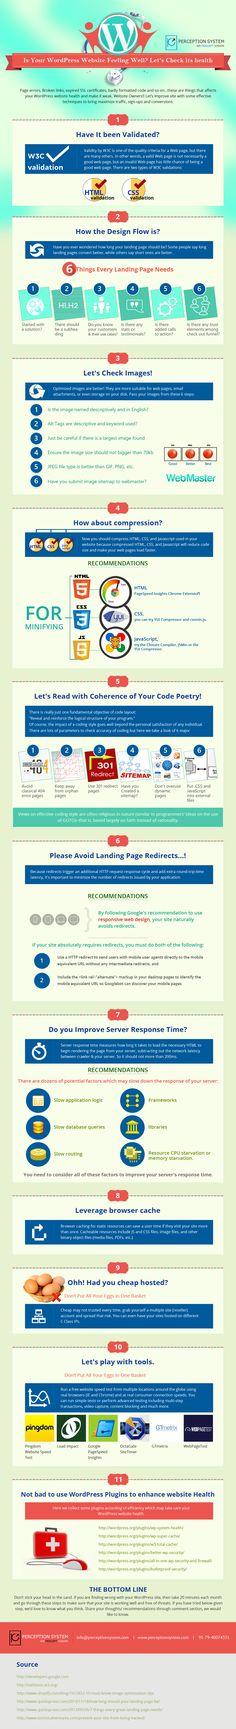 Cómo mantener WordPress con buena salud Source: www.perceptionsystem.com #infografia #infographic #socialmedia